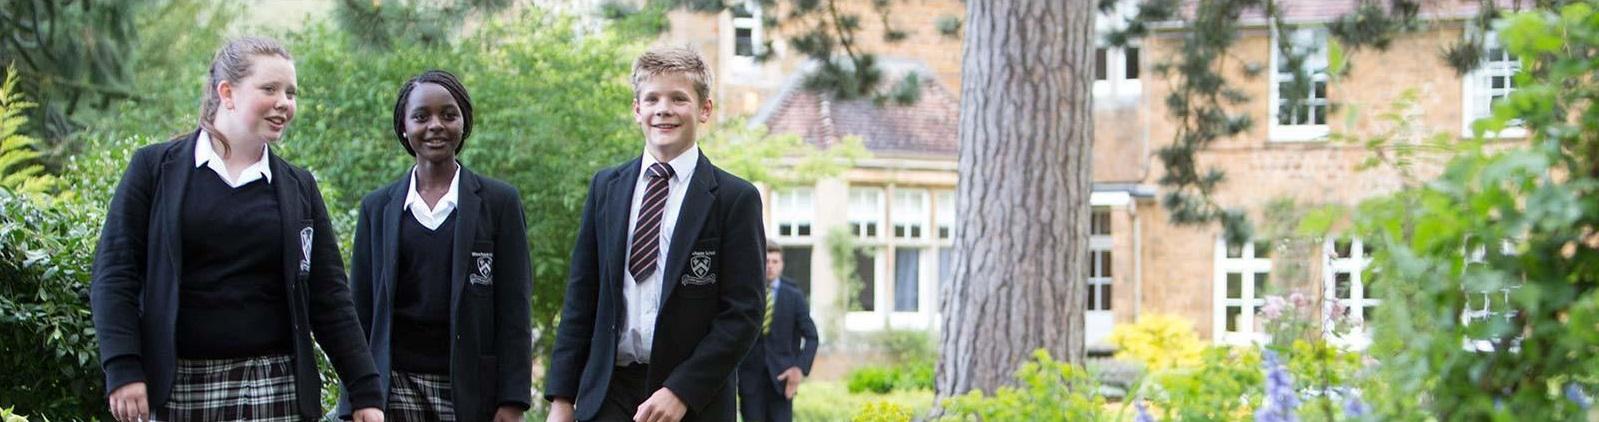 Bloxham School - pupils